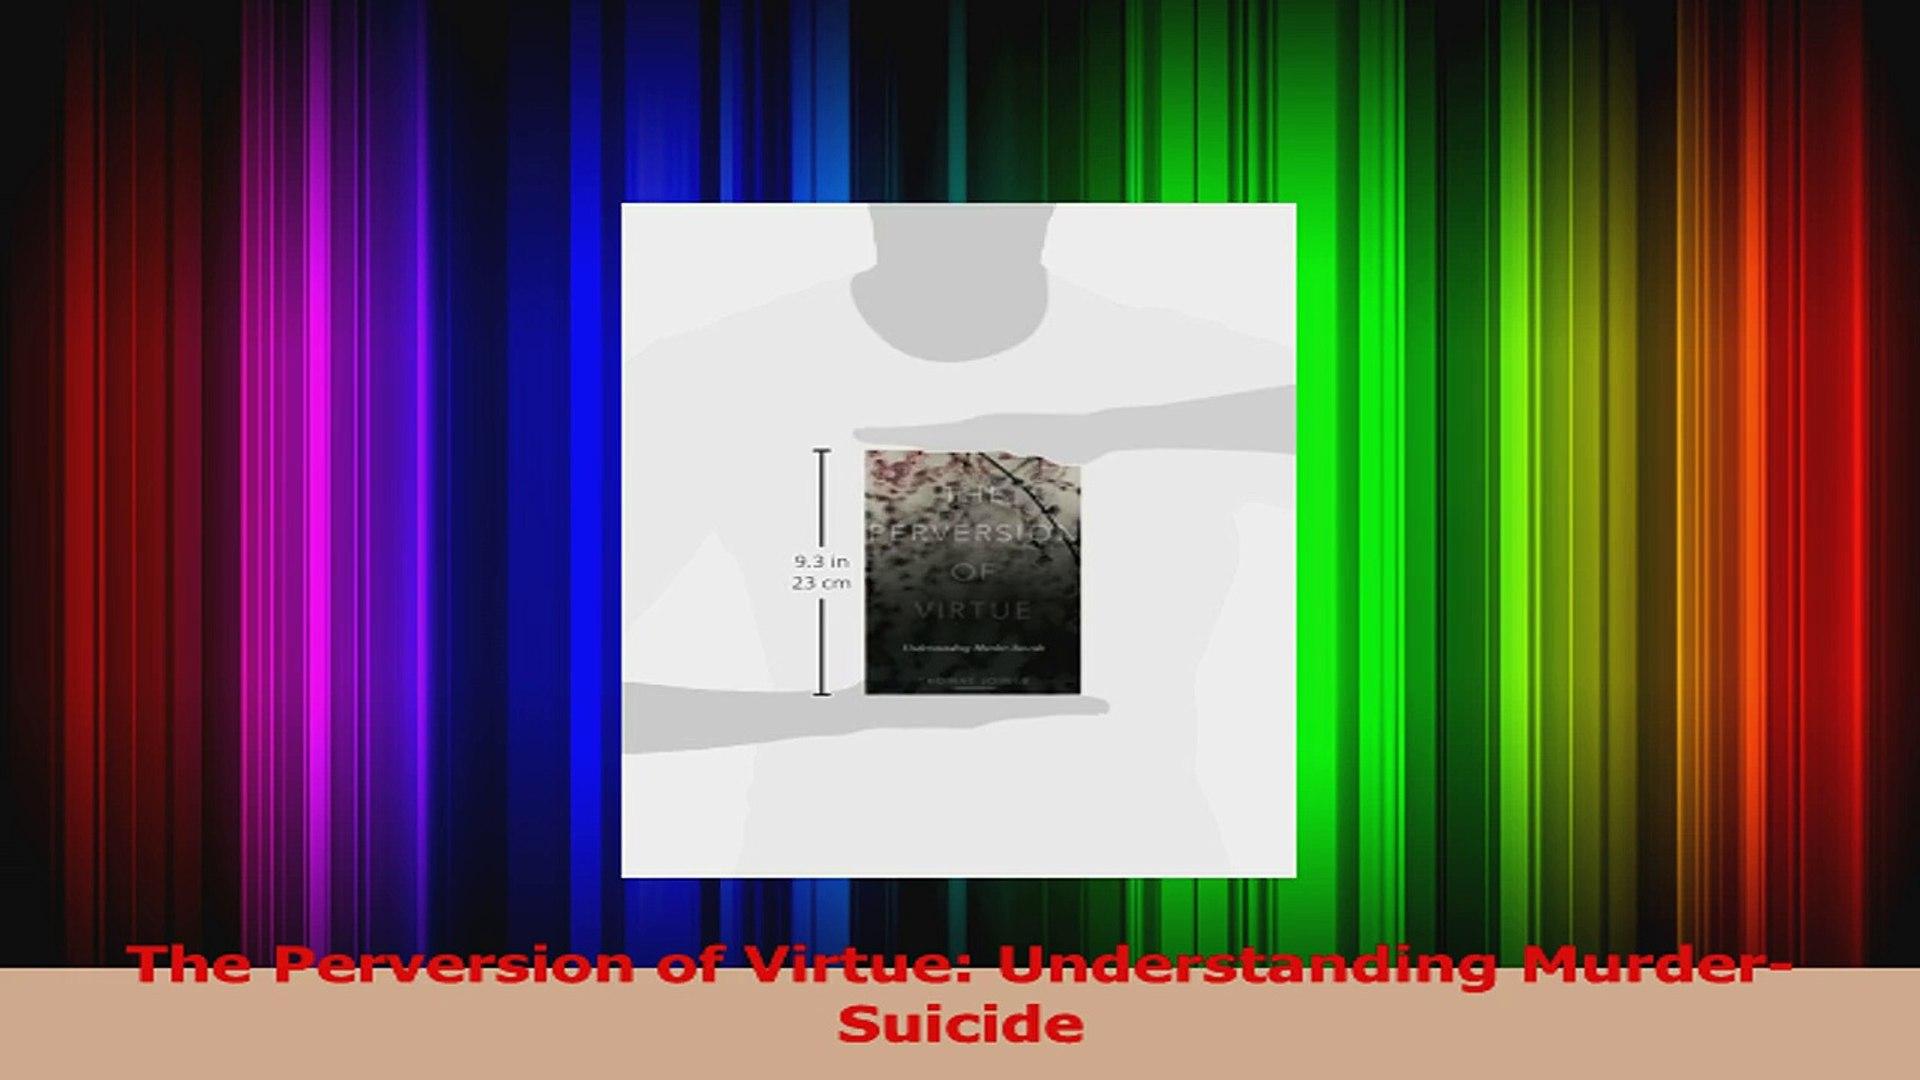 The Perversion of Virtue Understanding Murder-Suicide